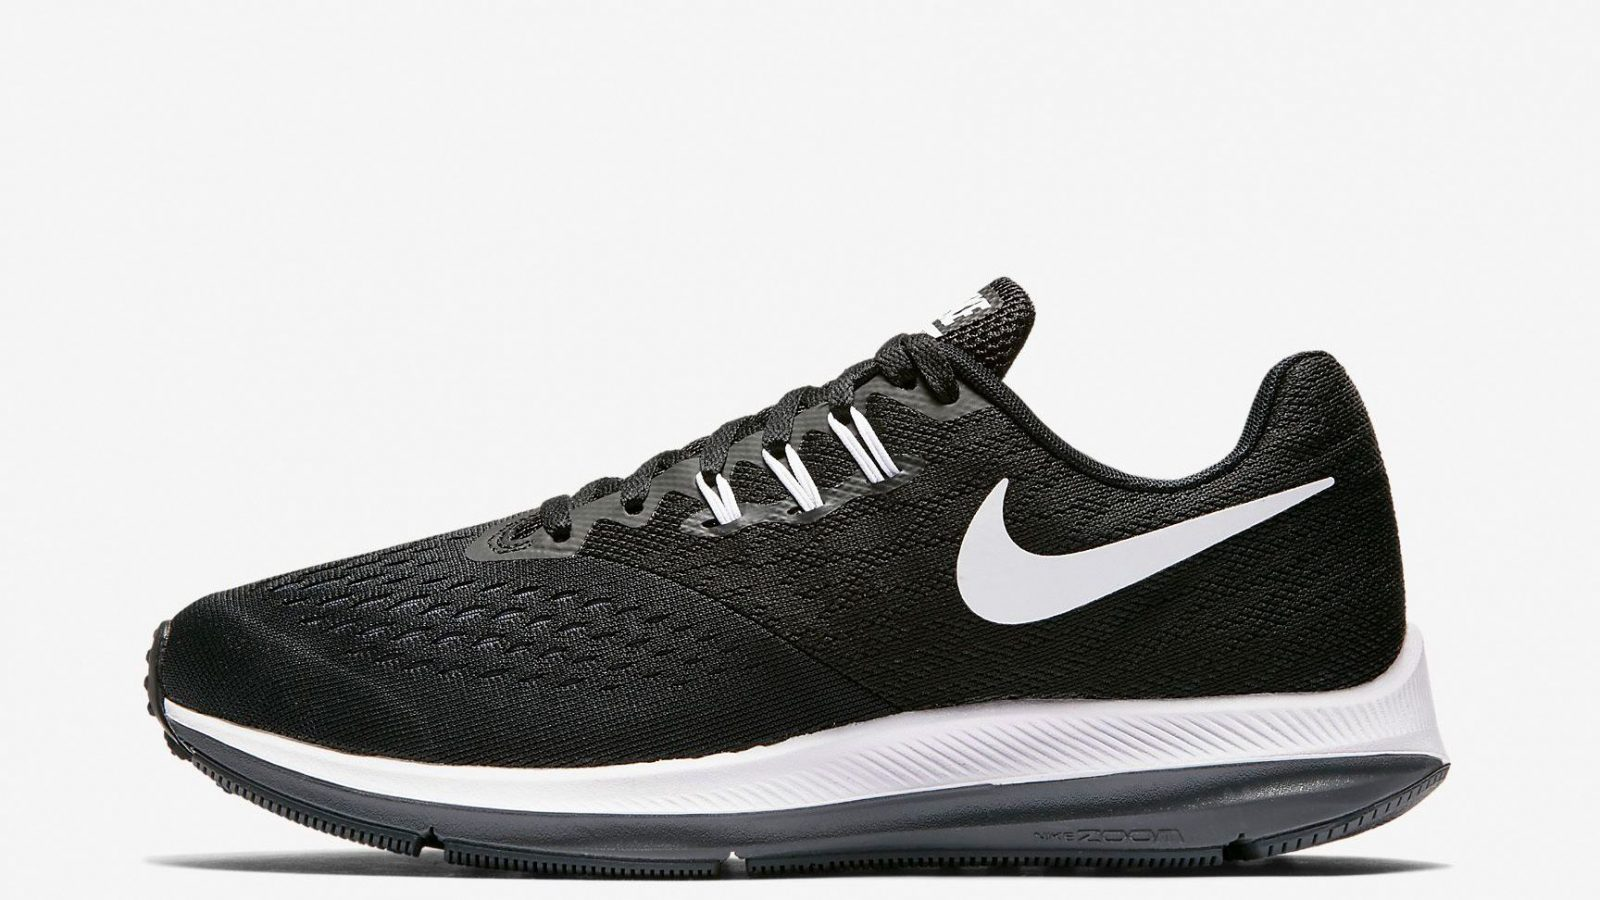 promo code b2b24 7ad92 Nike Air Zoom Winflo 4 Laufschuhe